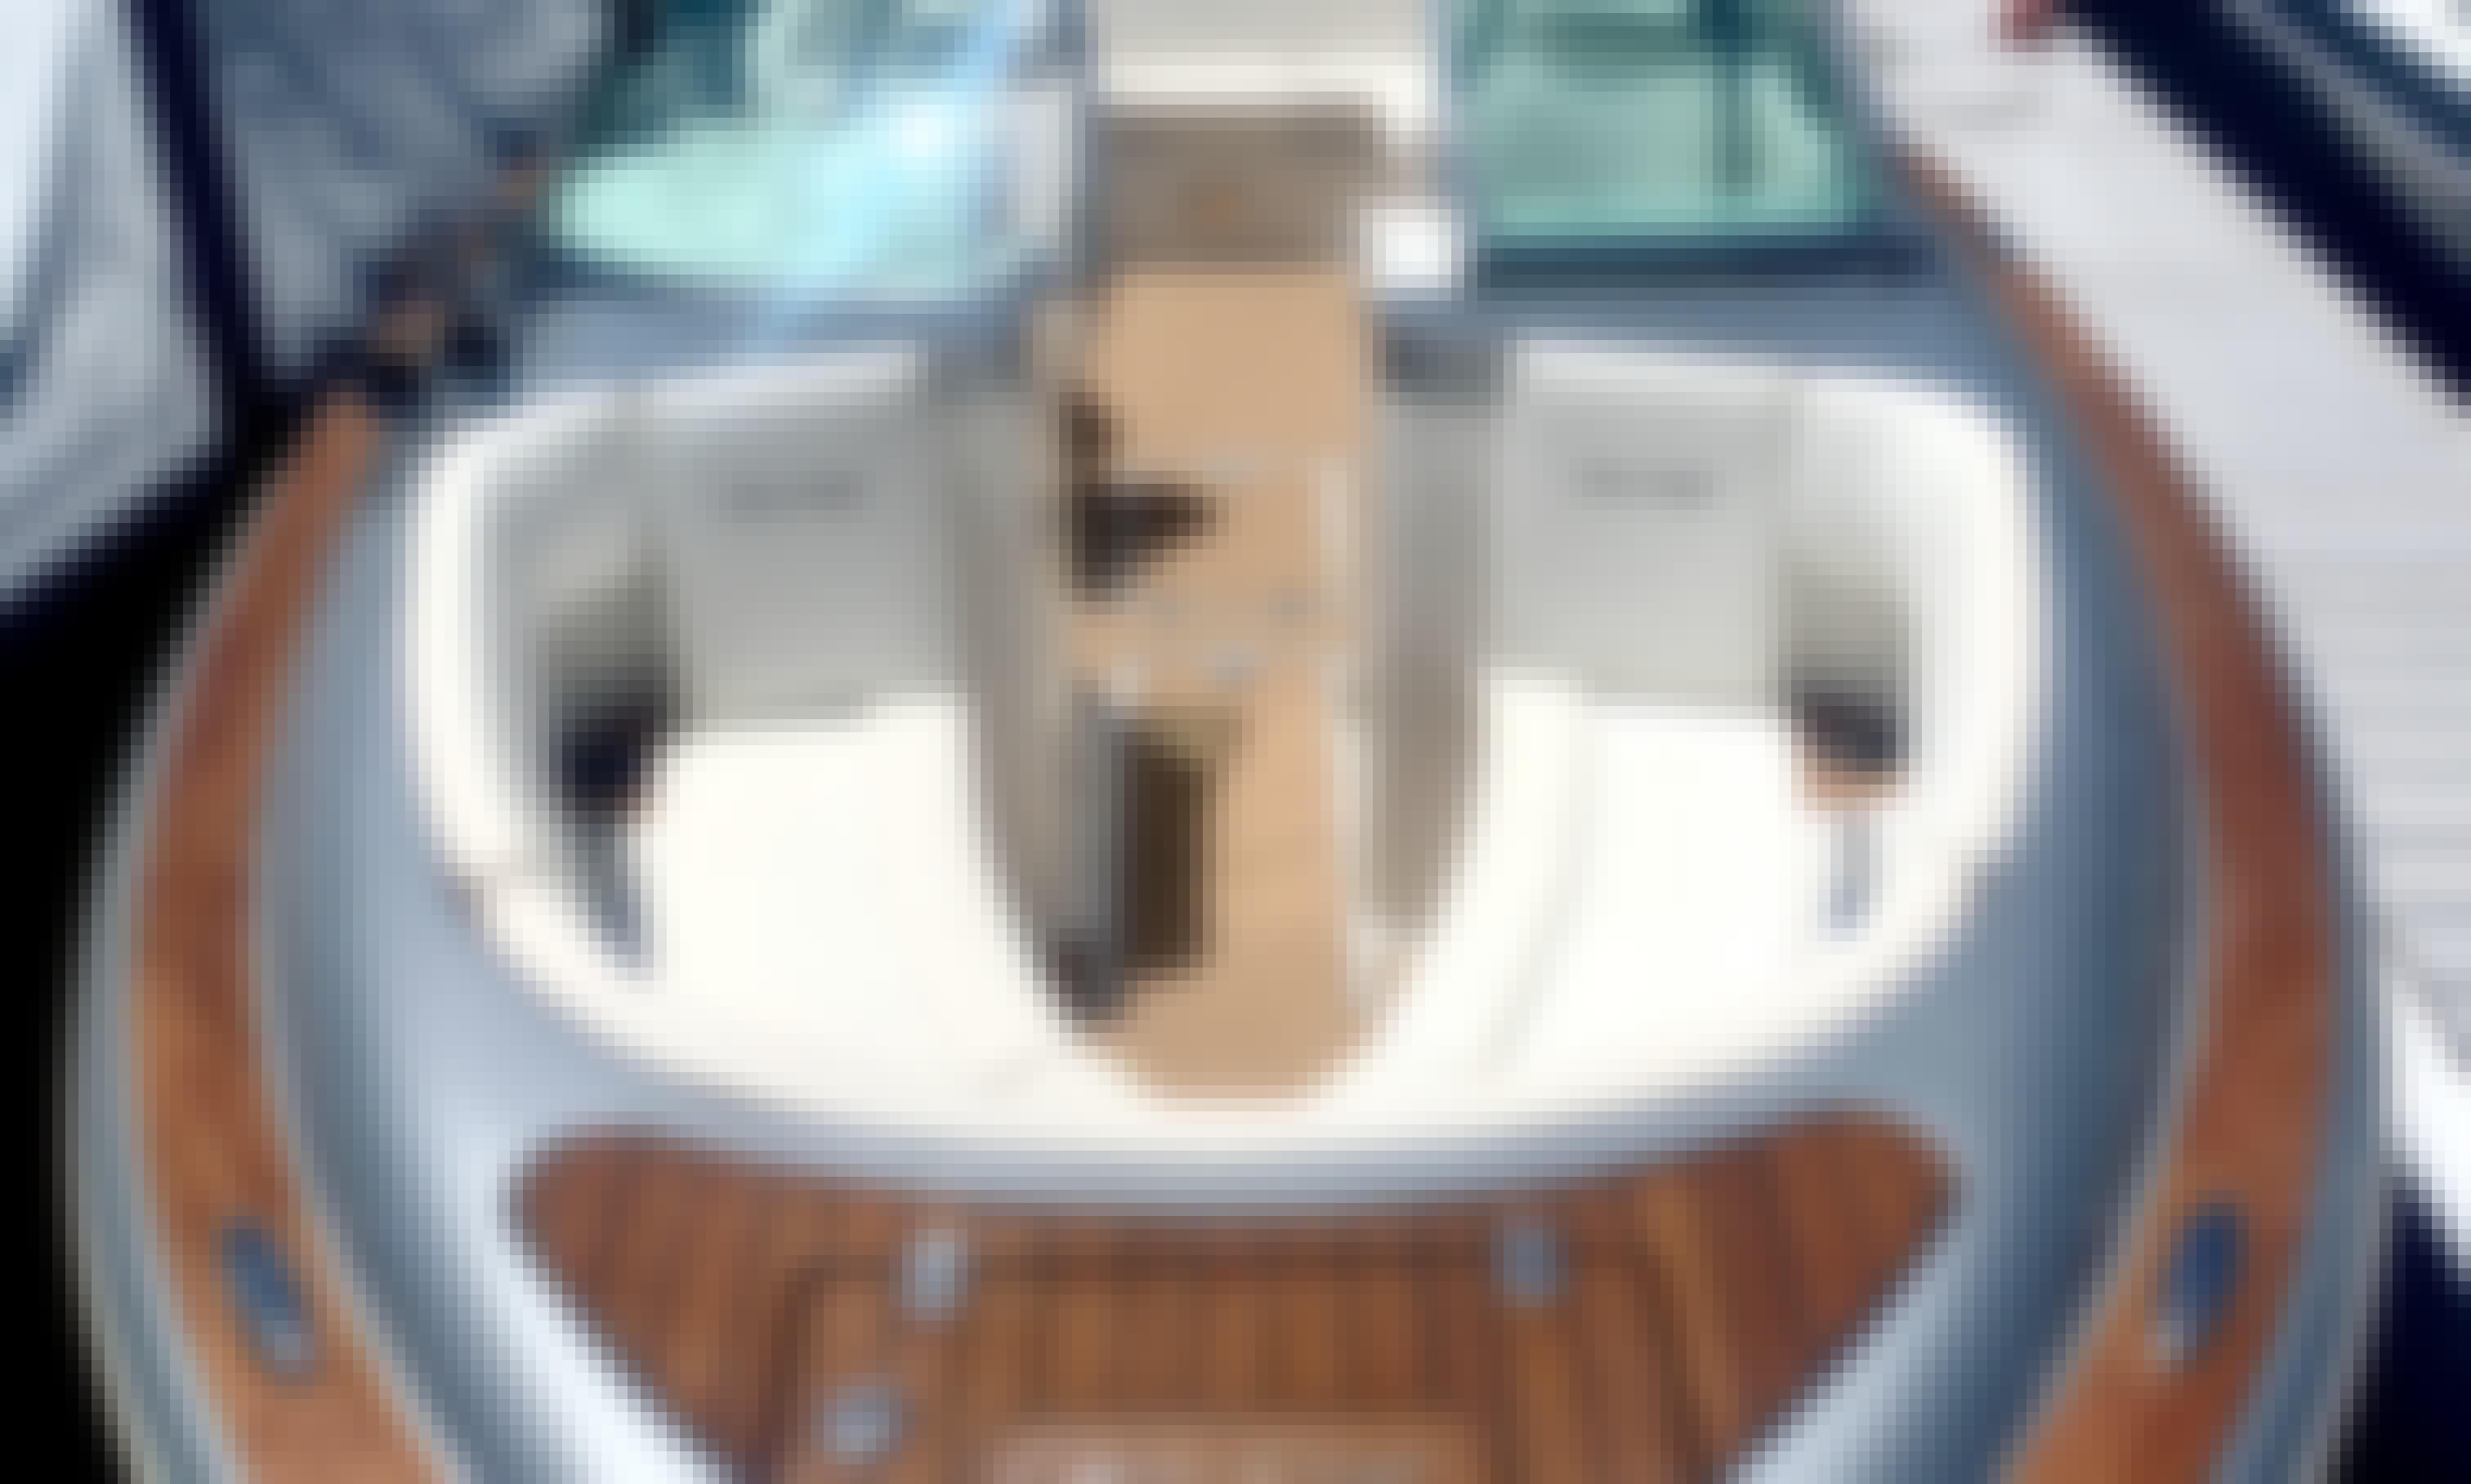 Luxury Chris Craft Launch 25 Power Yacht in Tahoe City, California